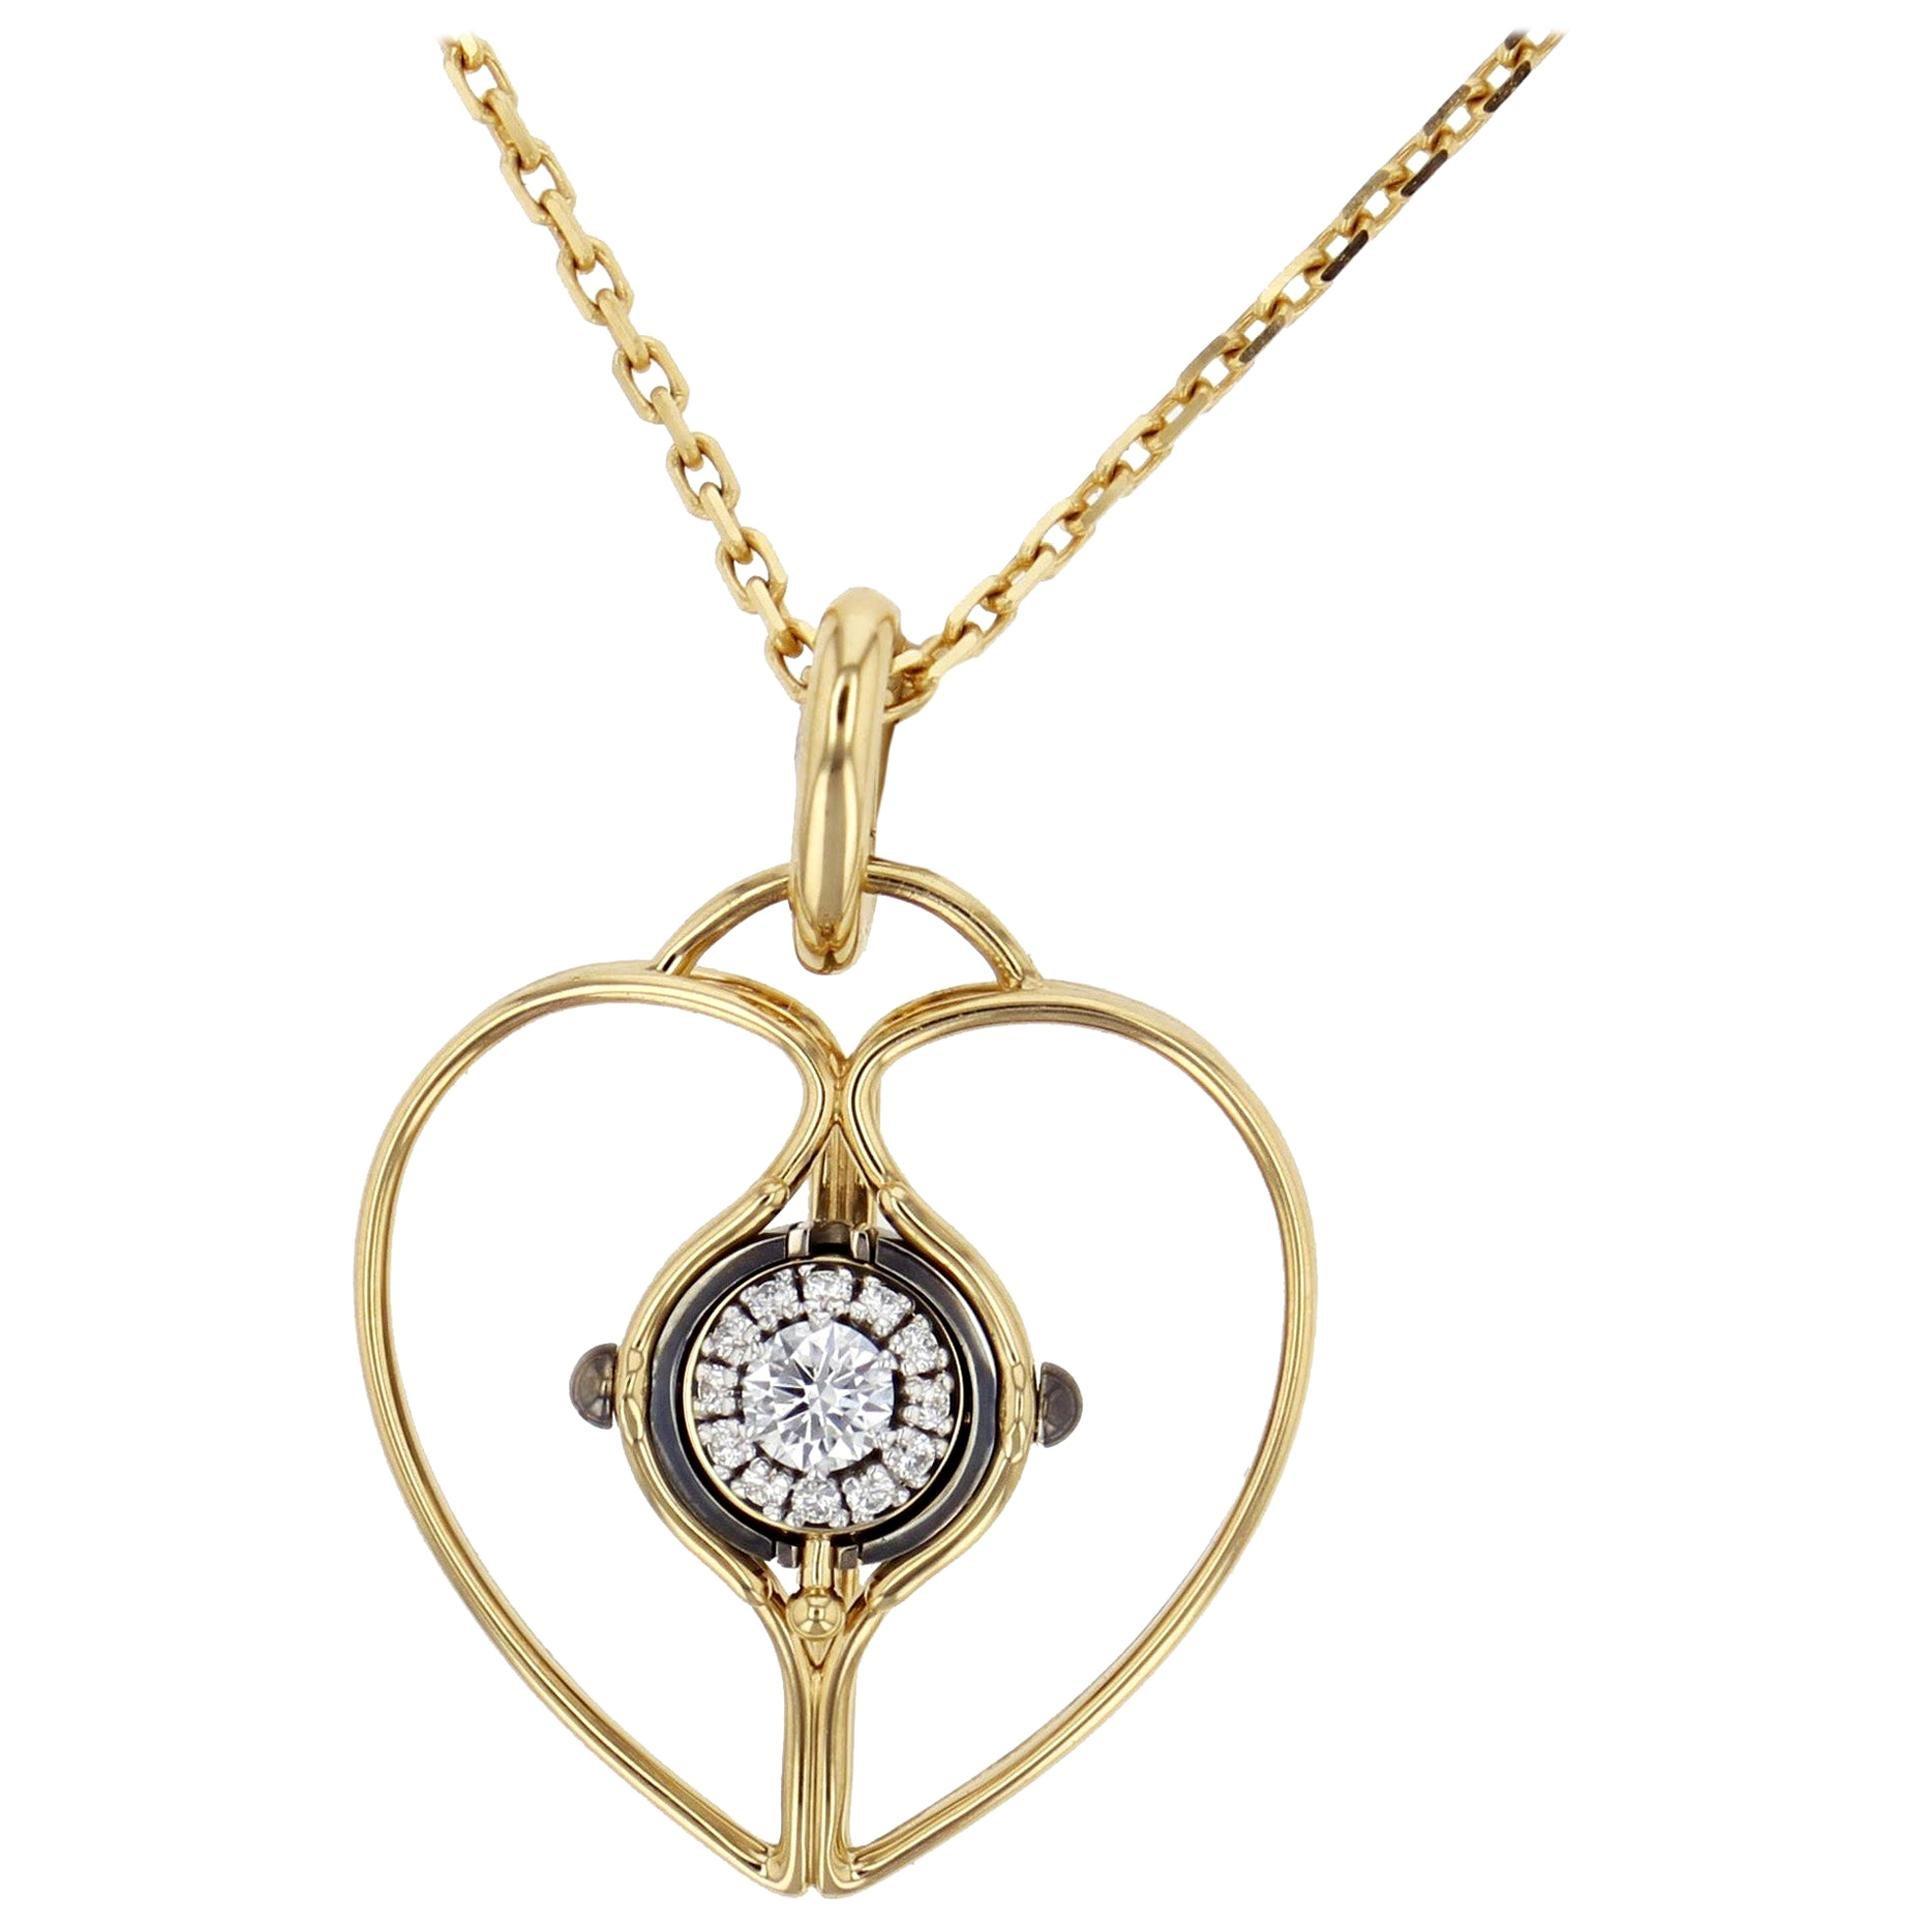 Mira Charm 18 Karat Yellow Gold and Diamond Heart by Elie Top